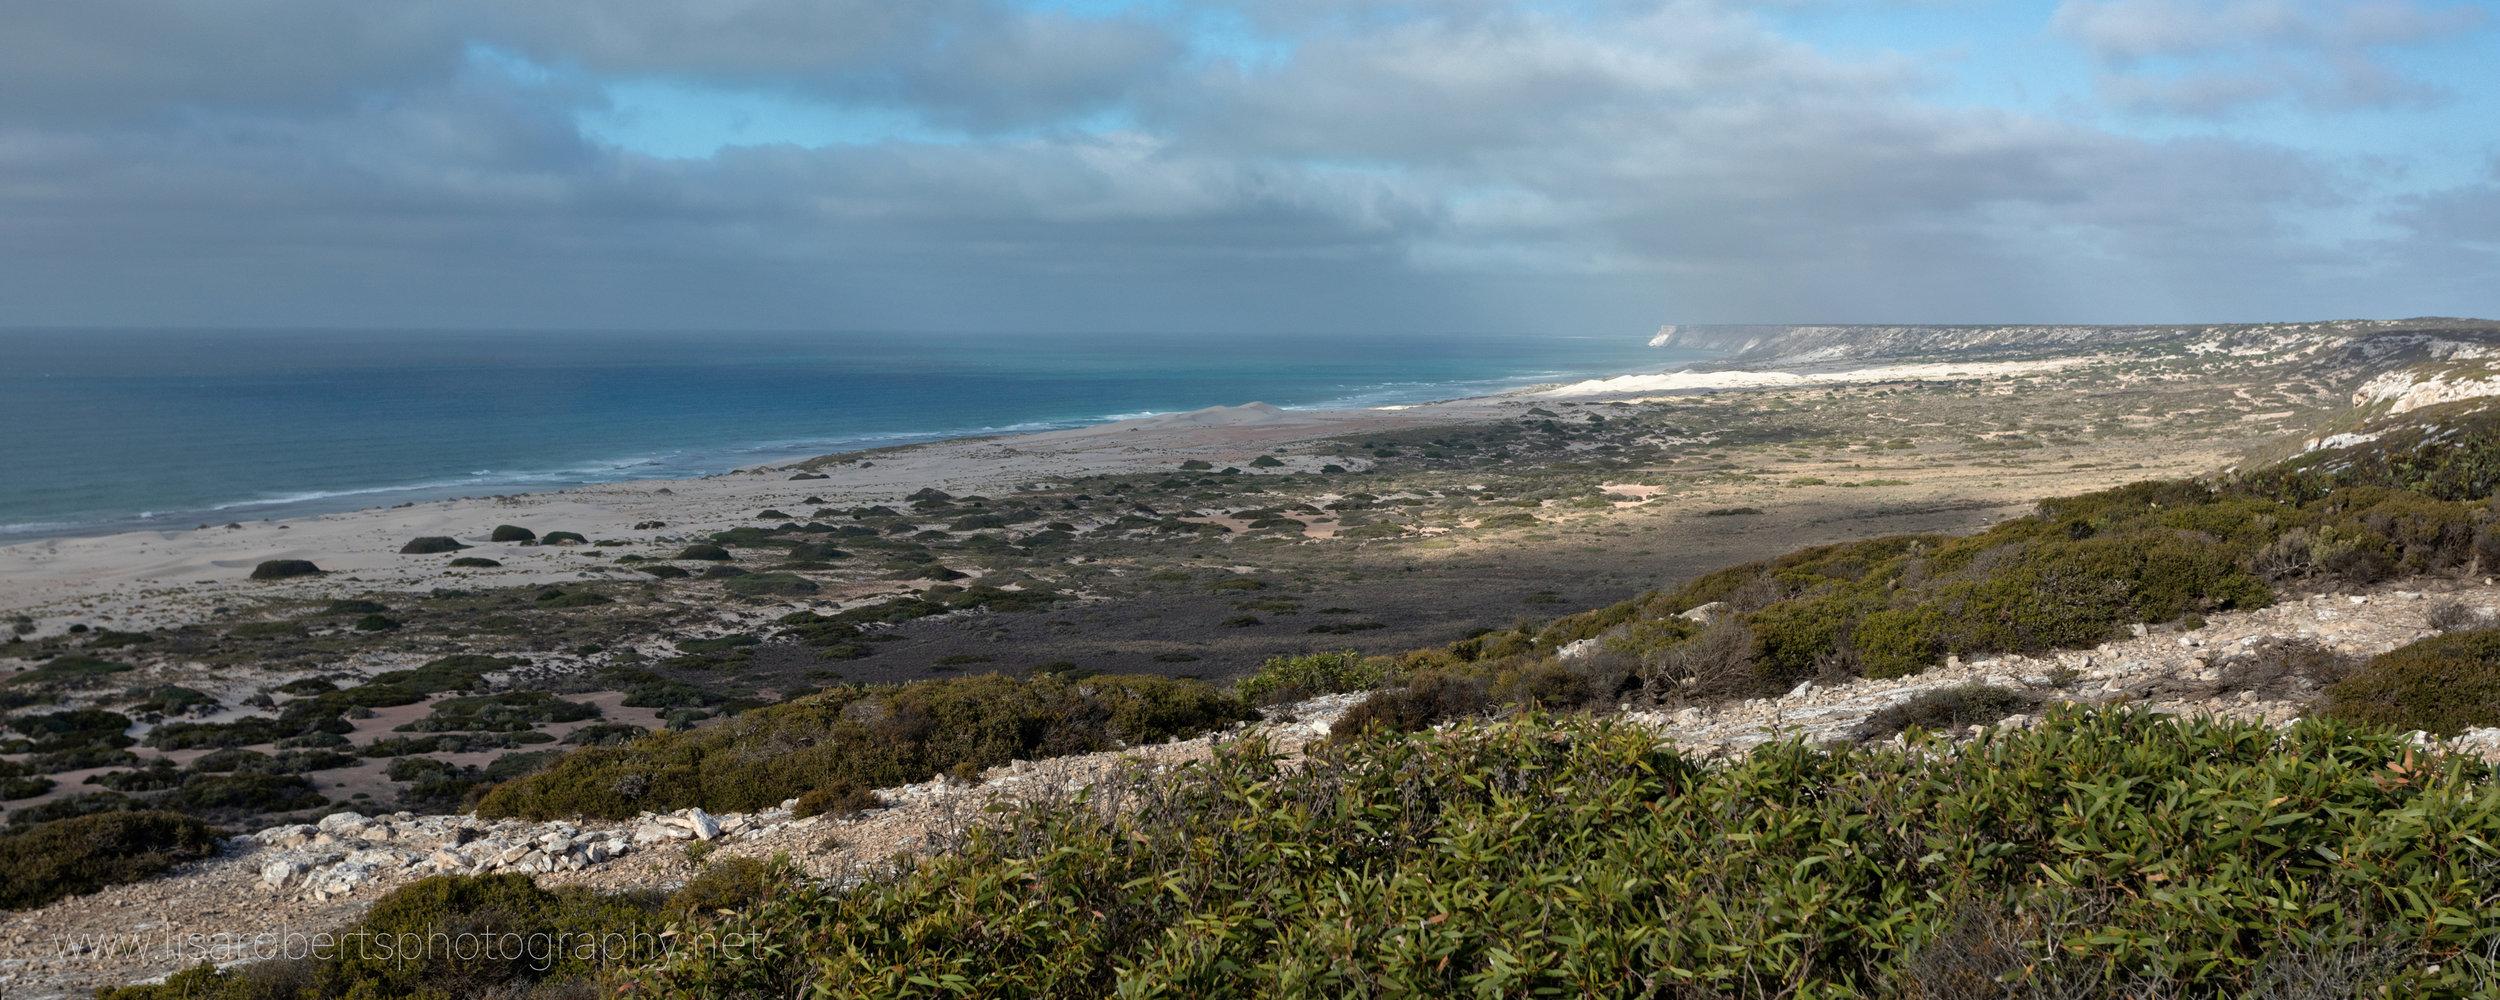 The Great Australian Bight, South Australia